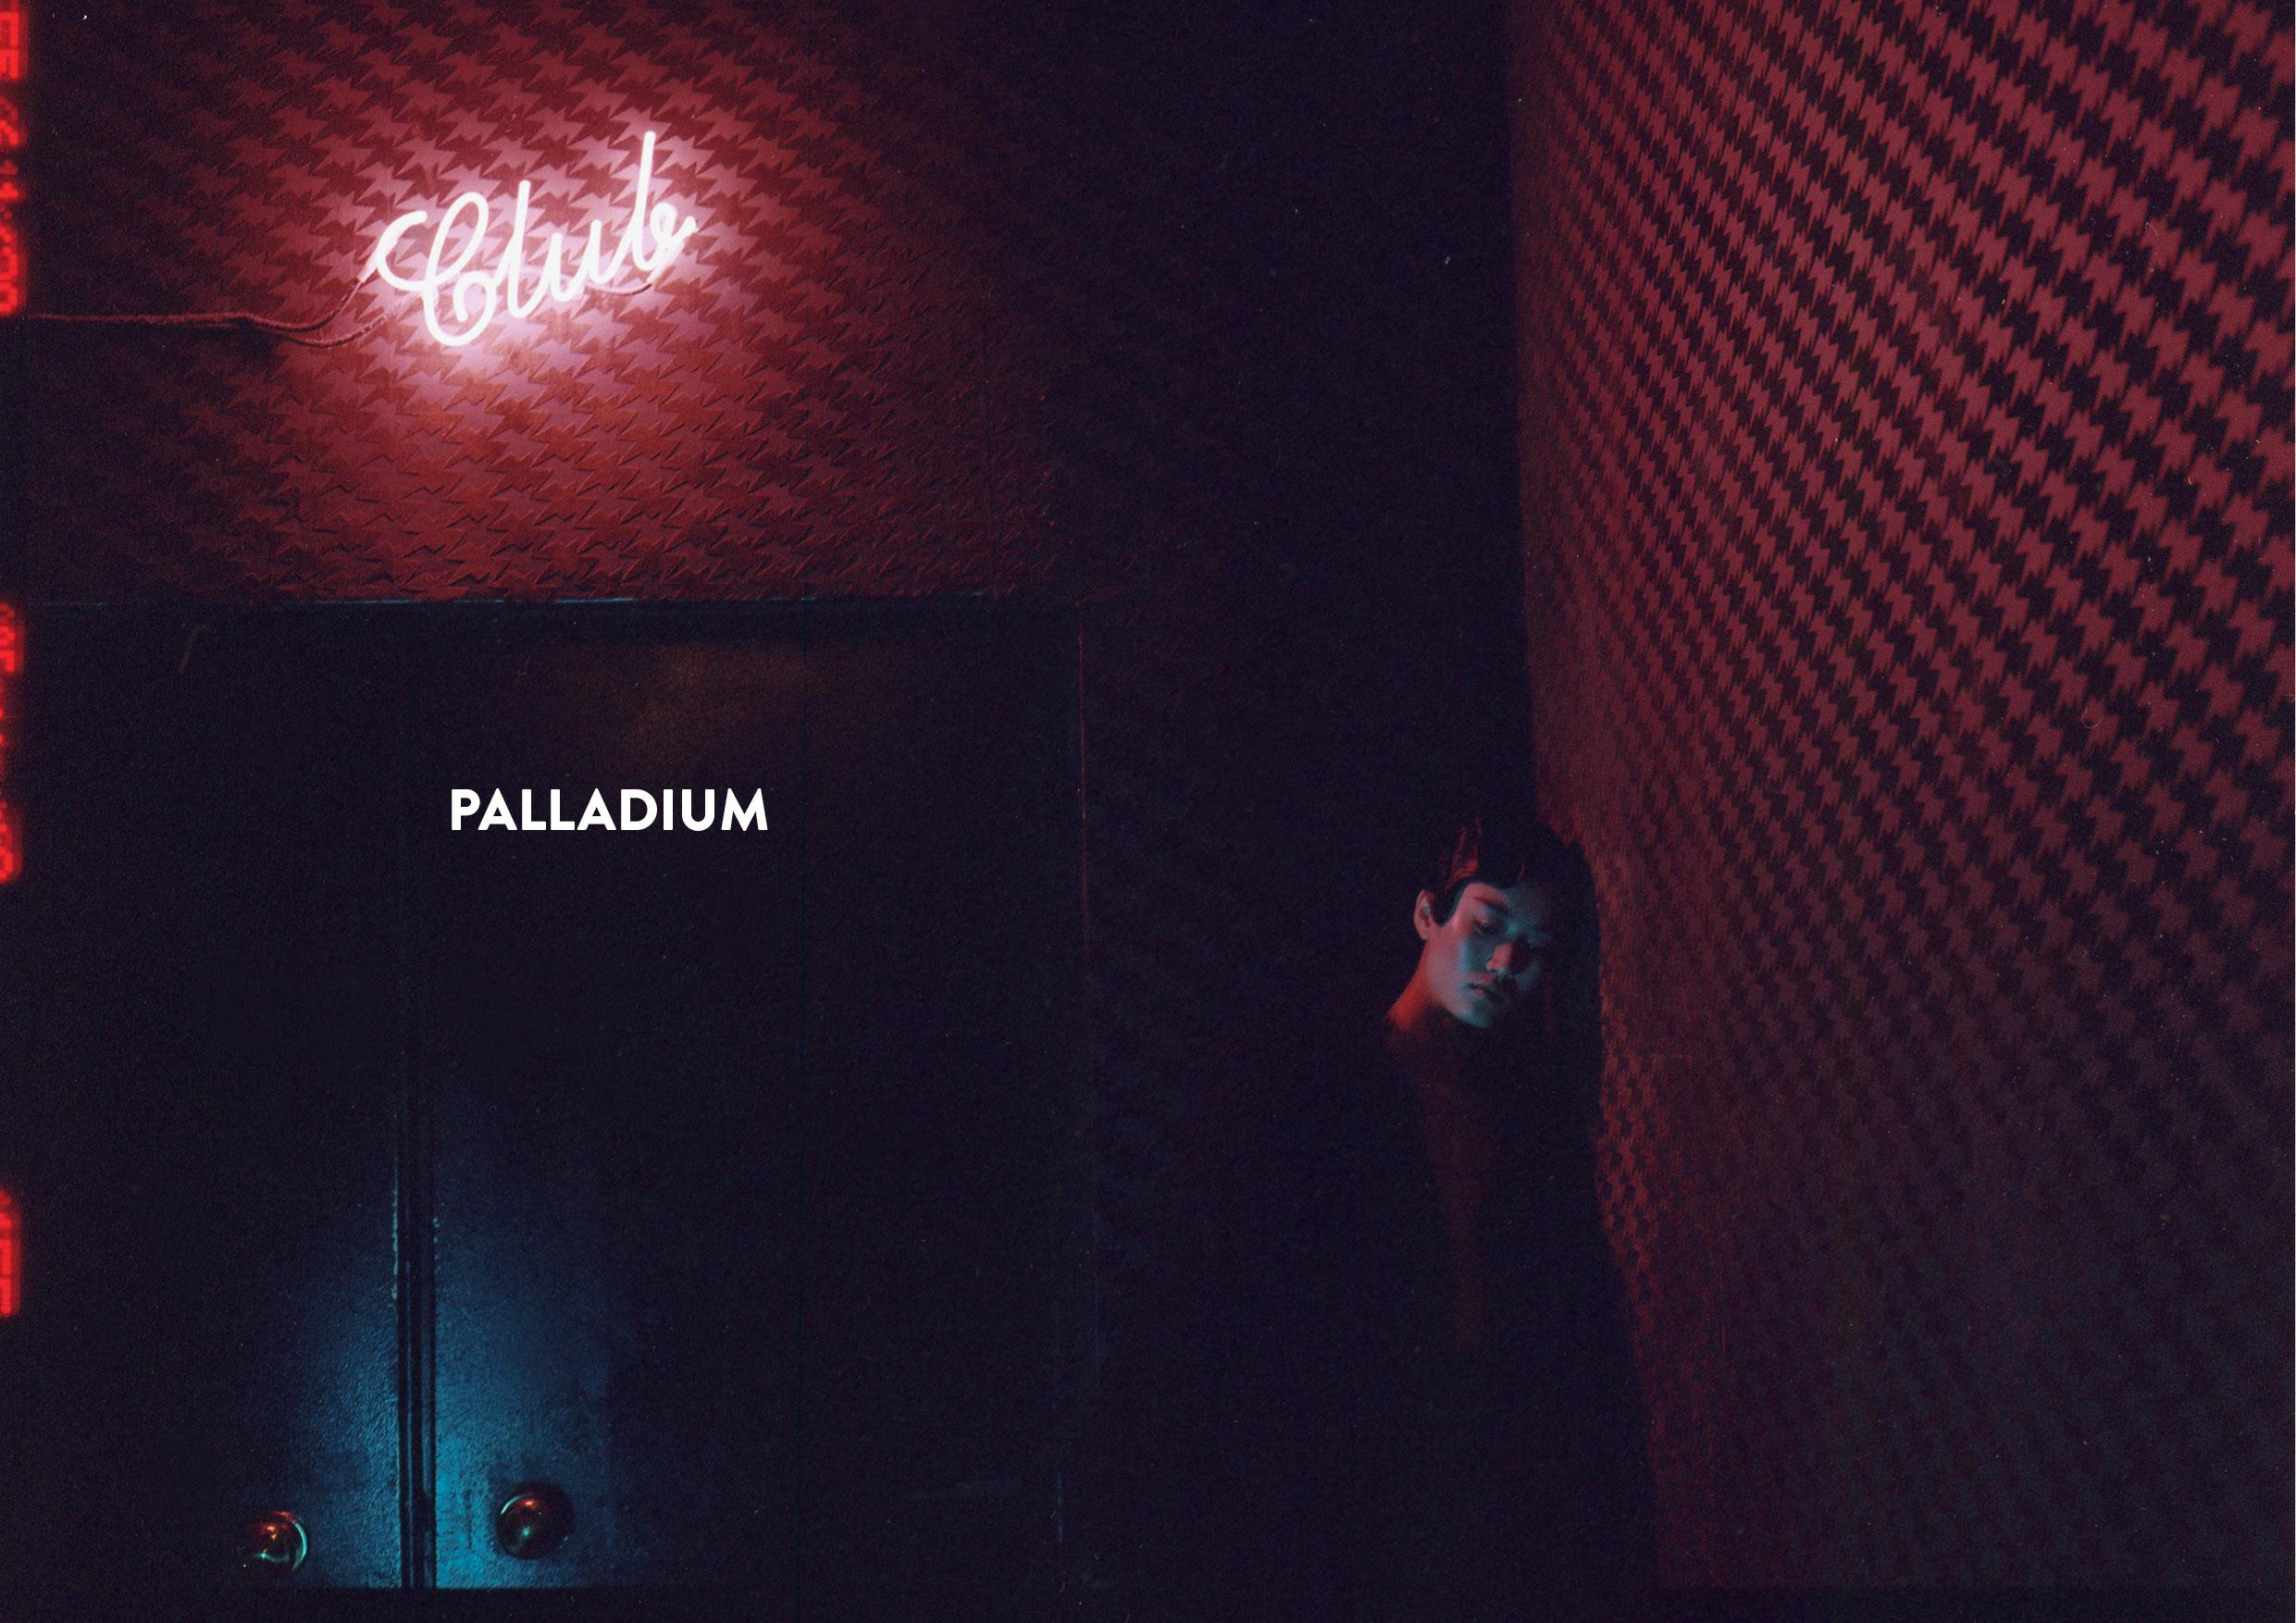 Palladium_001.jpg